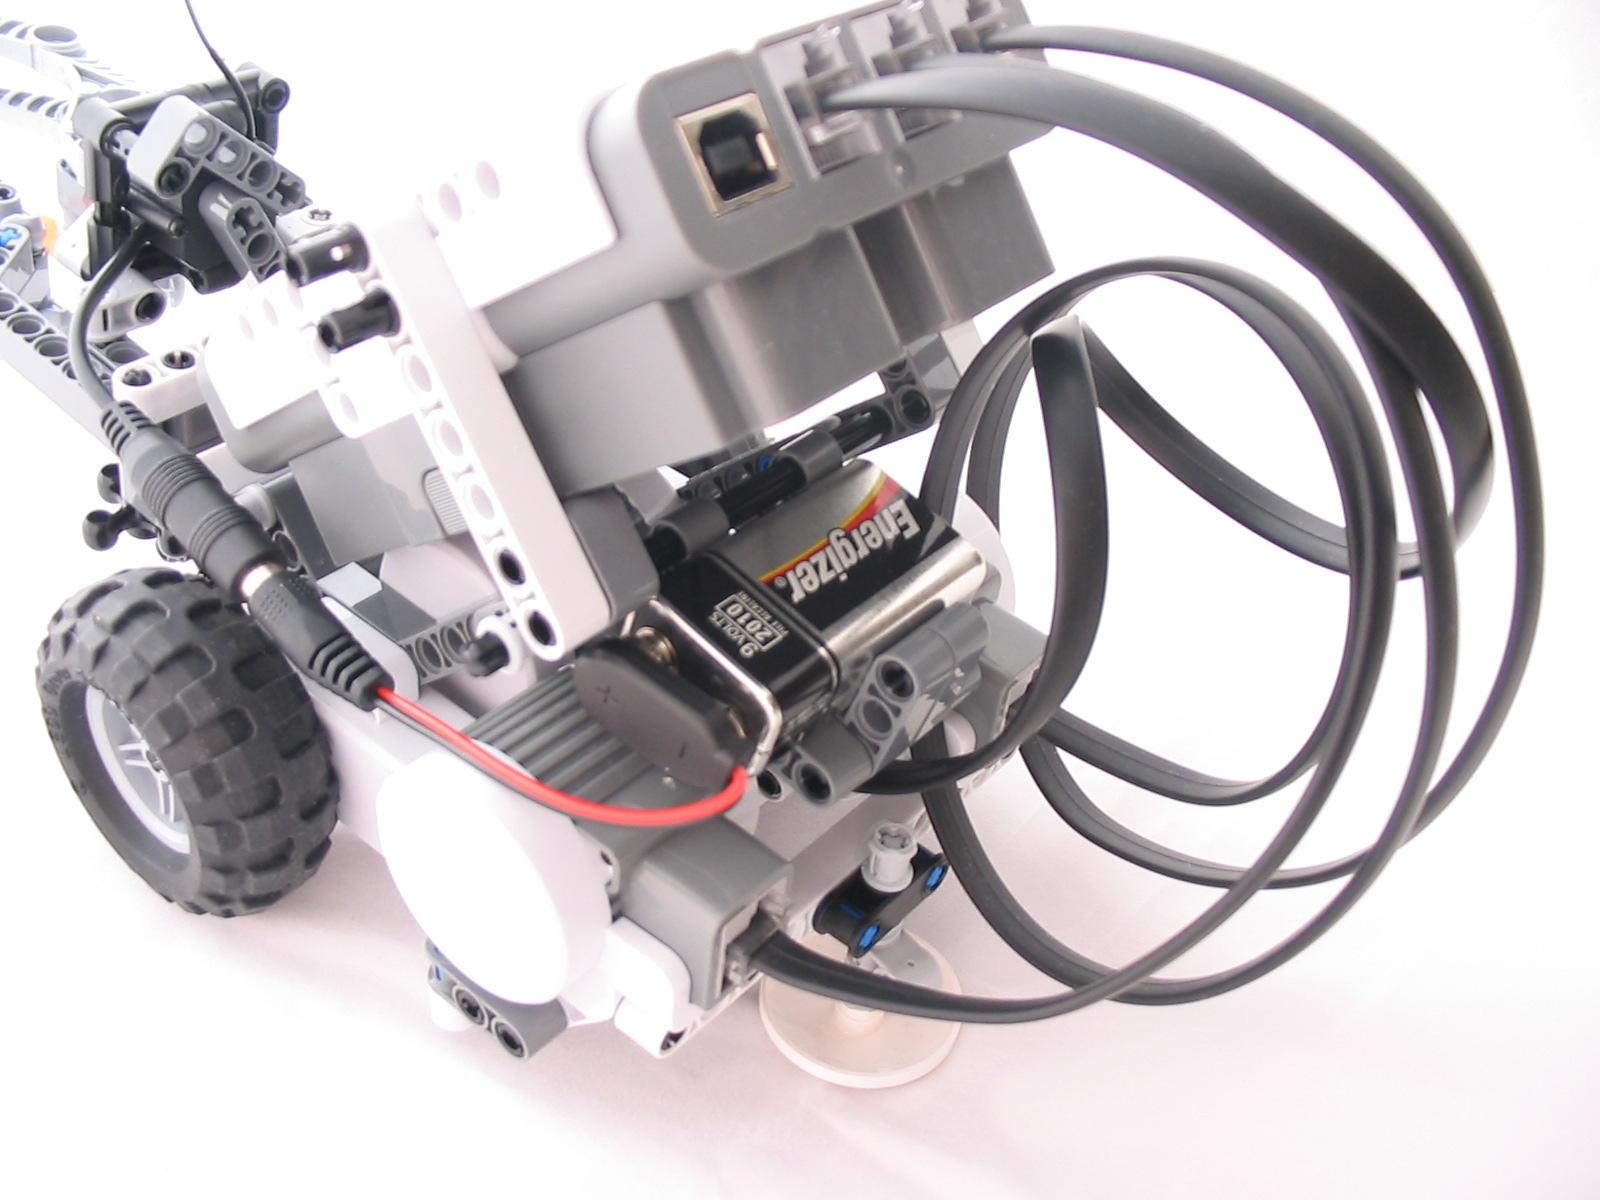 Camera Lego Mindstorm : Lego nxt ball grabber